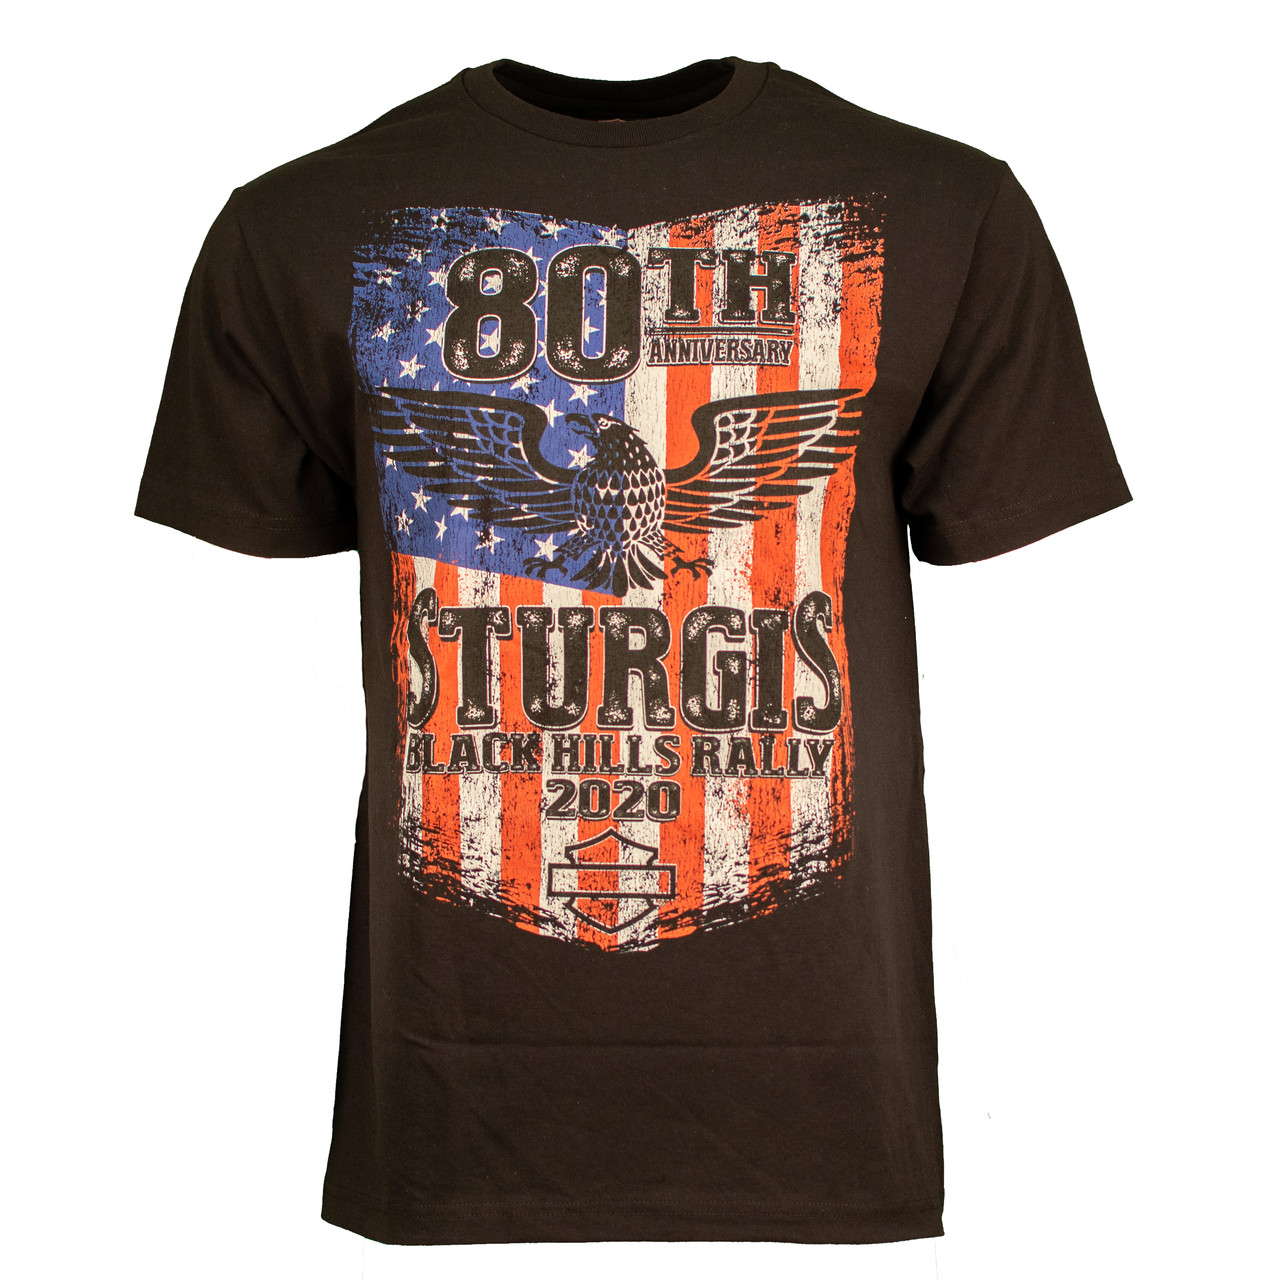 2020 Sturgis Shirt Black Hills Rally Motorcycle South Dakota T-shirt Size S-3XL